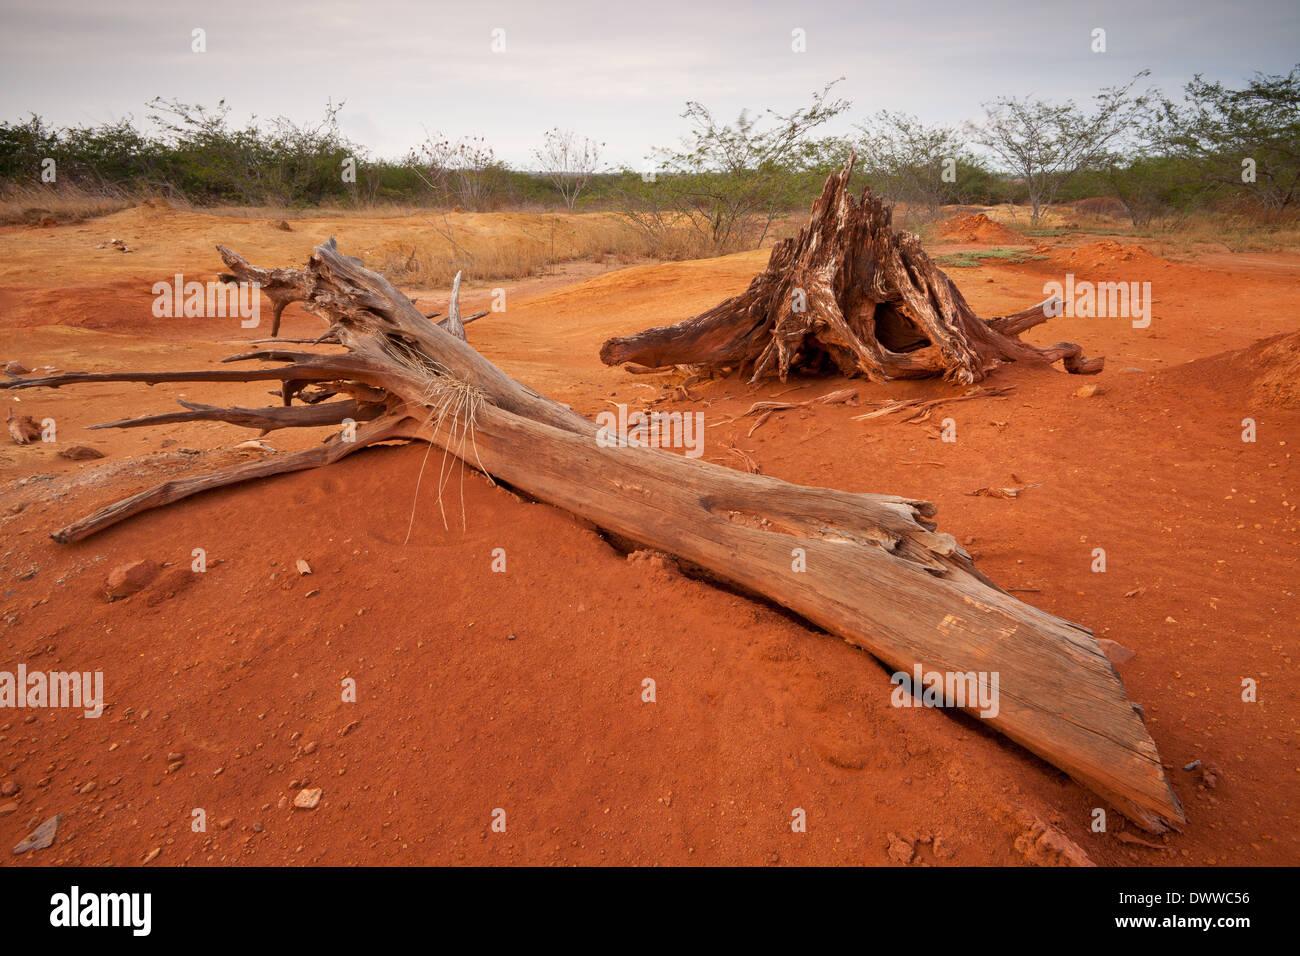 Dry root and tree trunk in Sarigua national park (desert), Herrera province, Republic of Panama. Stock Photo